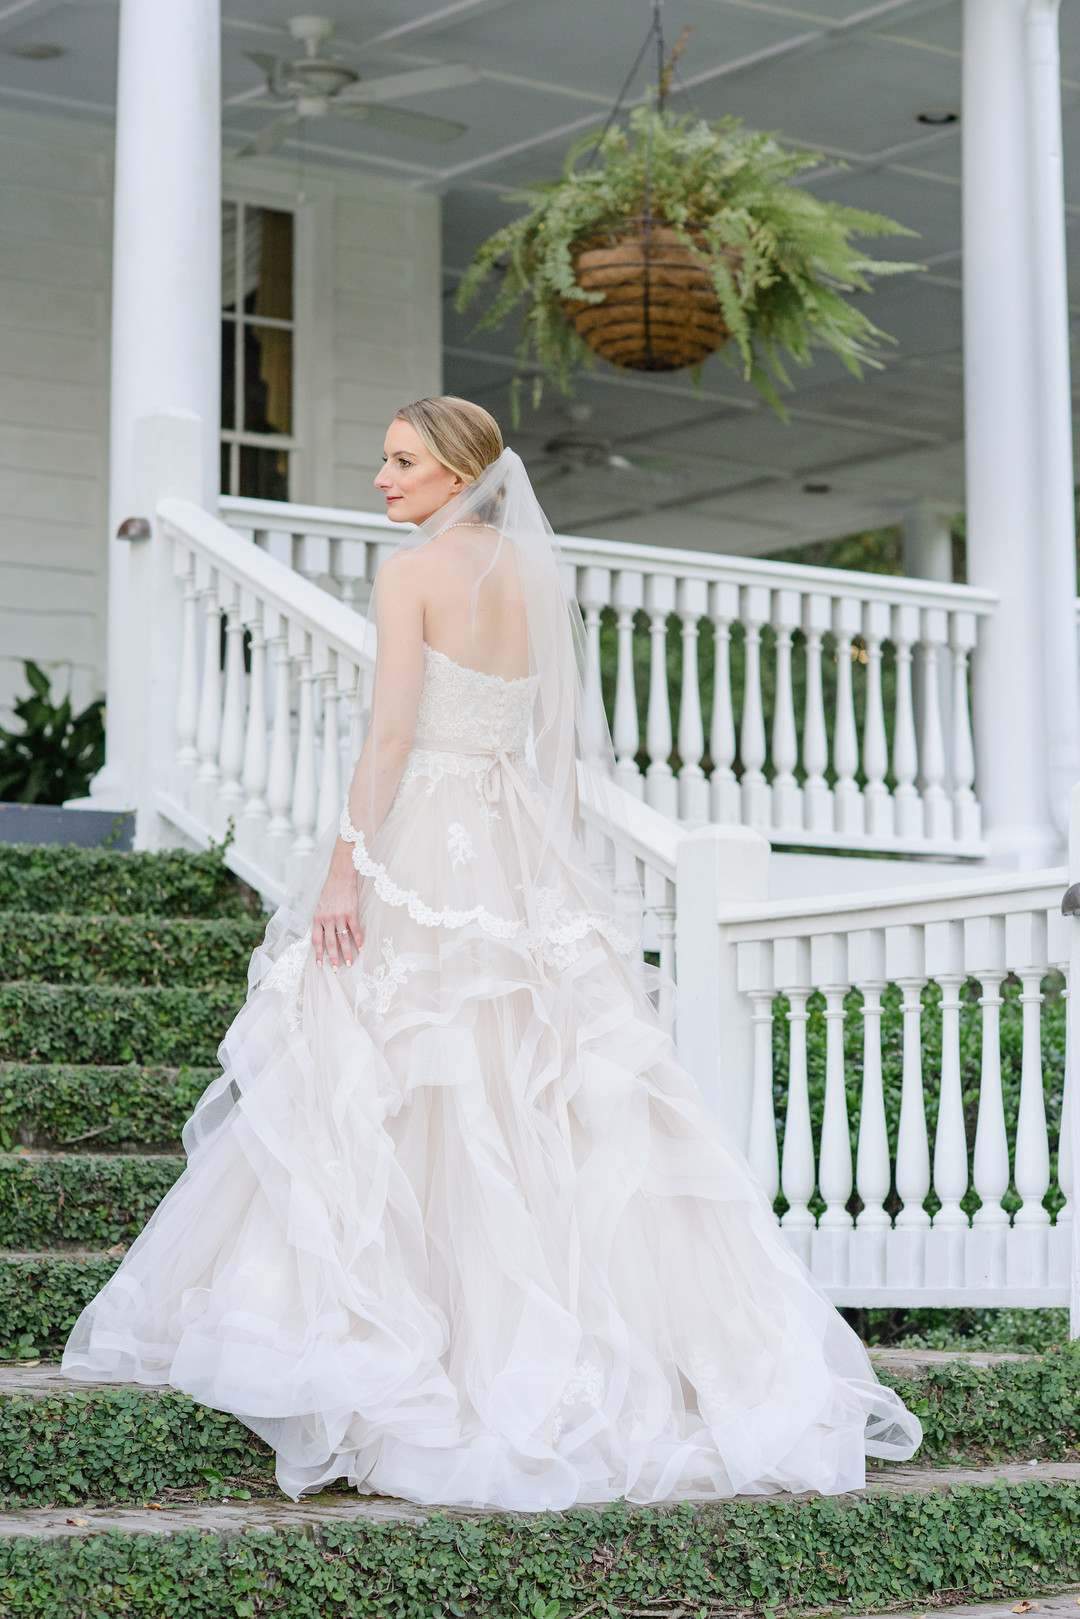 old-wide-awake-plantation-wedding-12.JPG